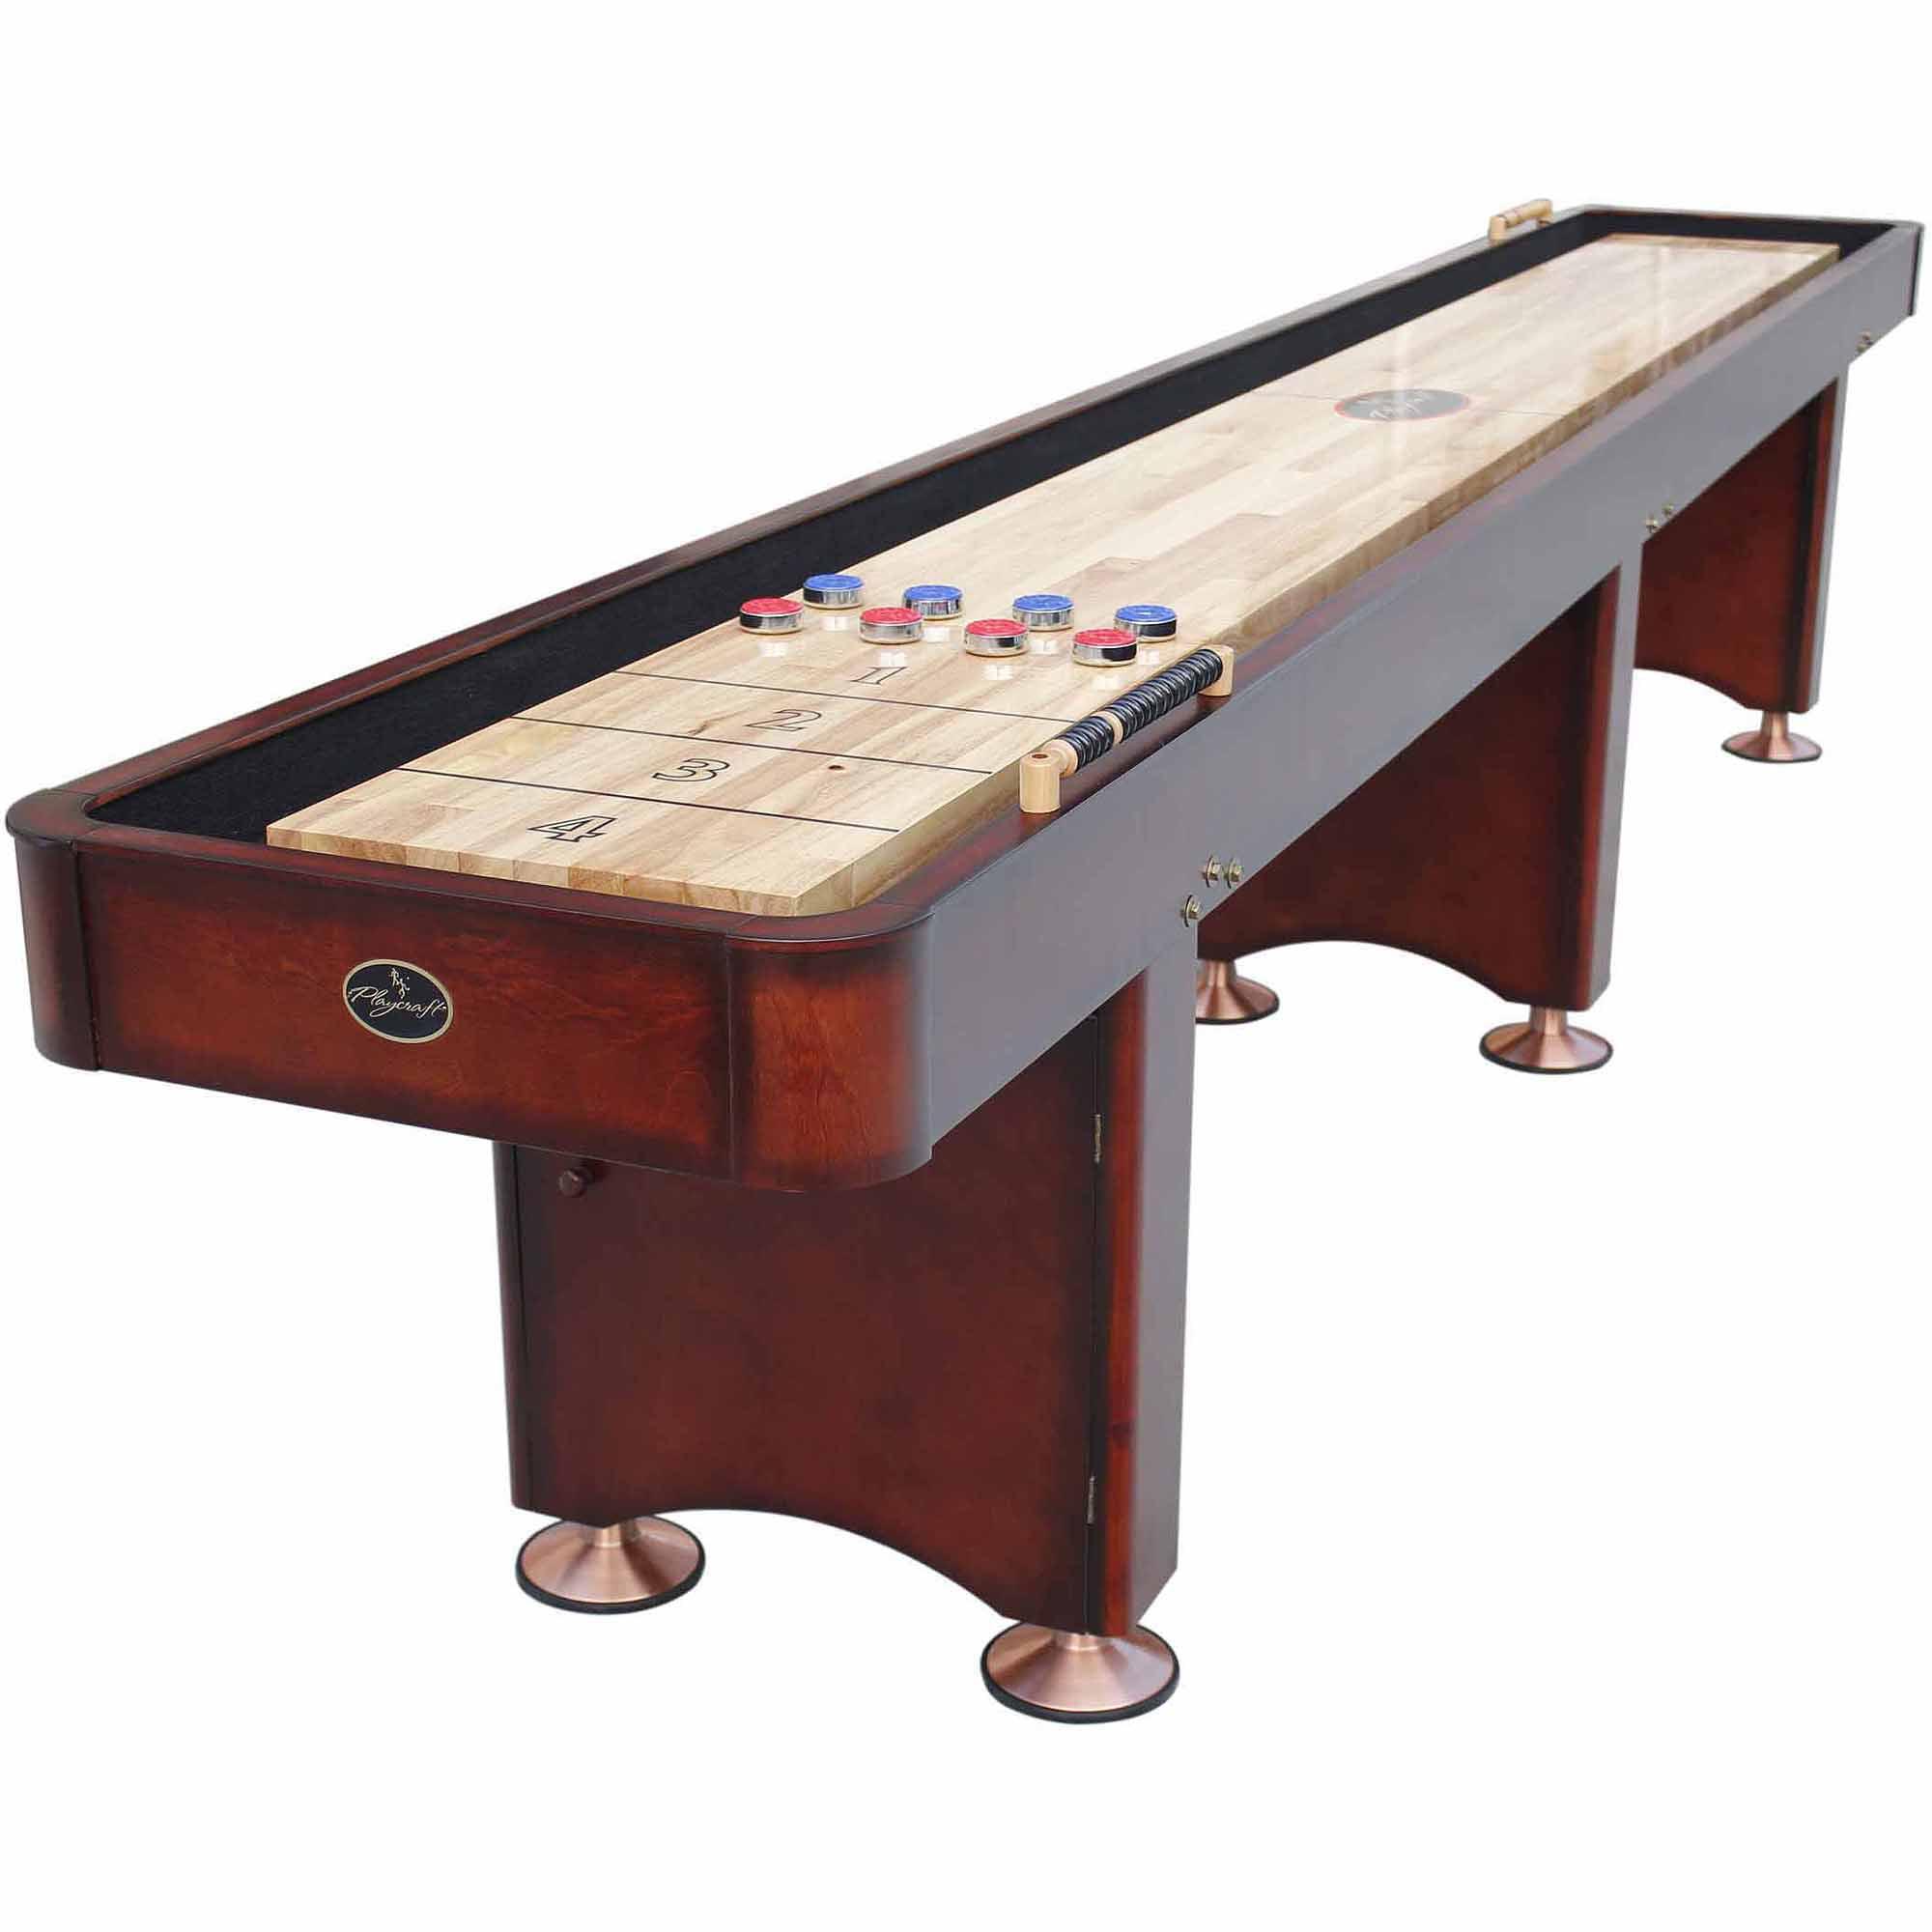 rack walmart com product wine wood classic with shuffleboard barrington reviews ft table